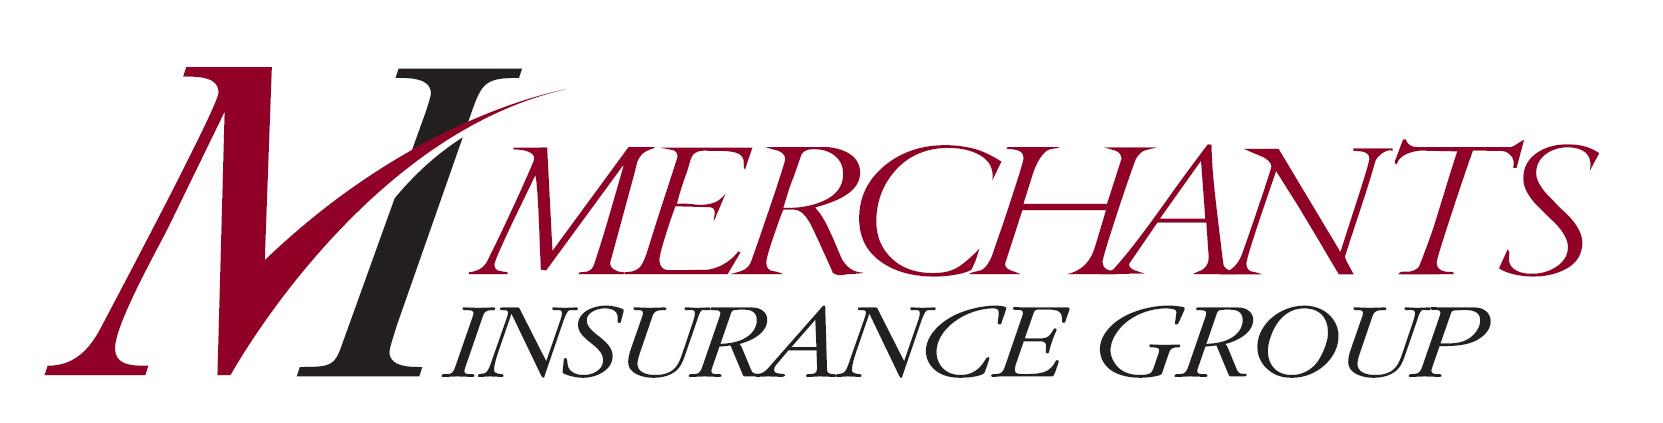 merchants_insurance_group.jpg